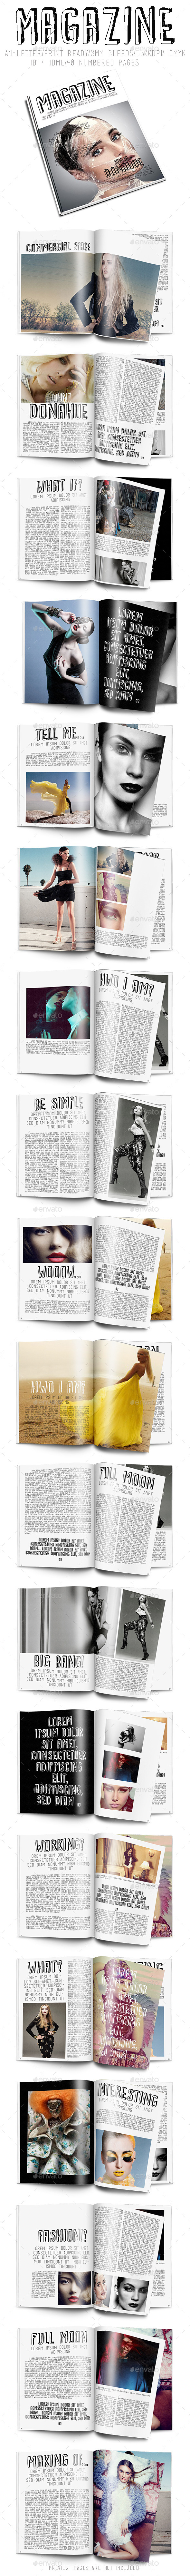 GraphicRiver Style Magazine 8987958